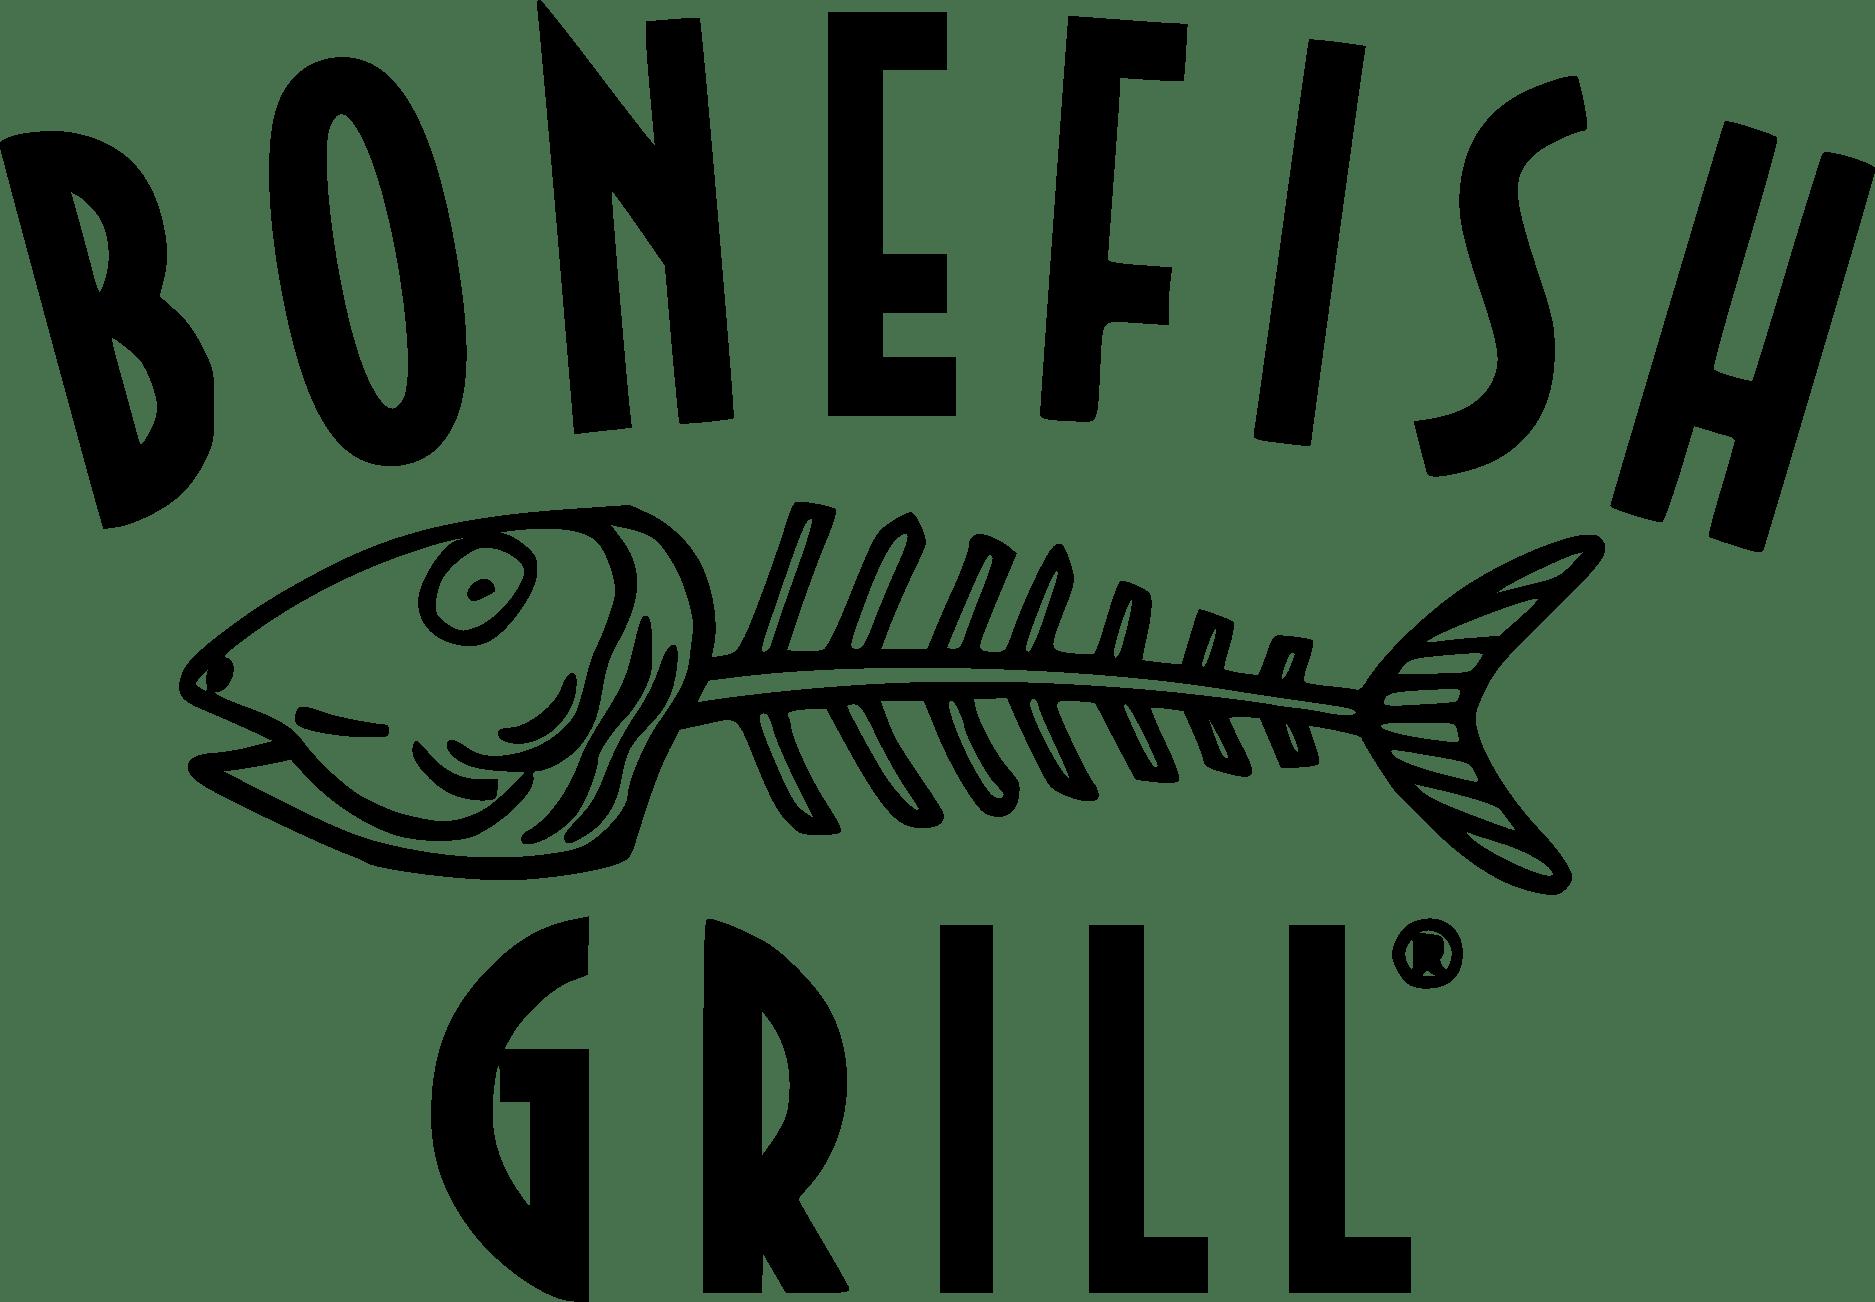 Bonefish Grill Logo Download Vector.